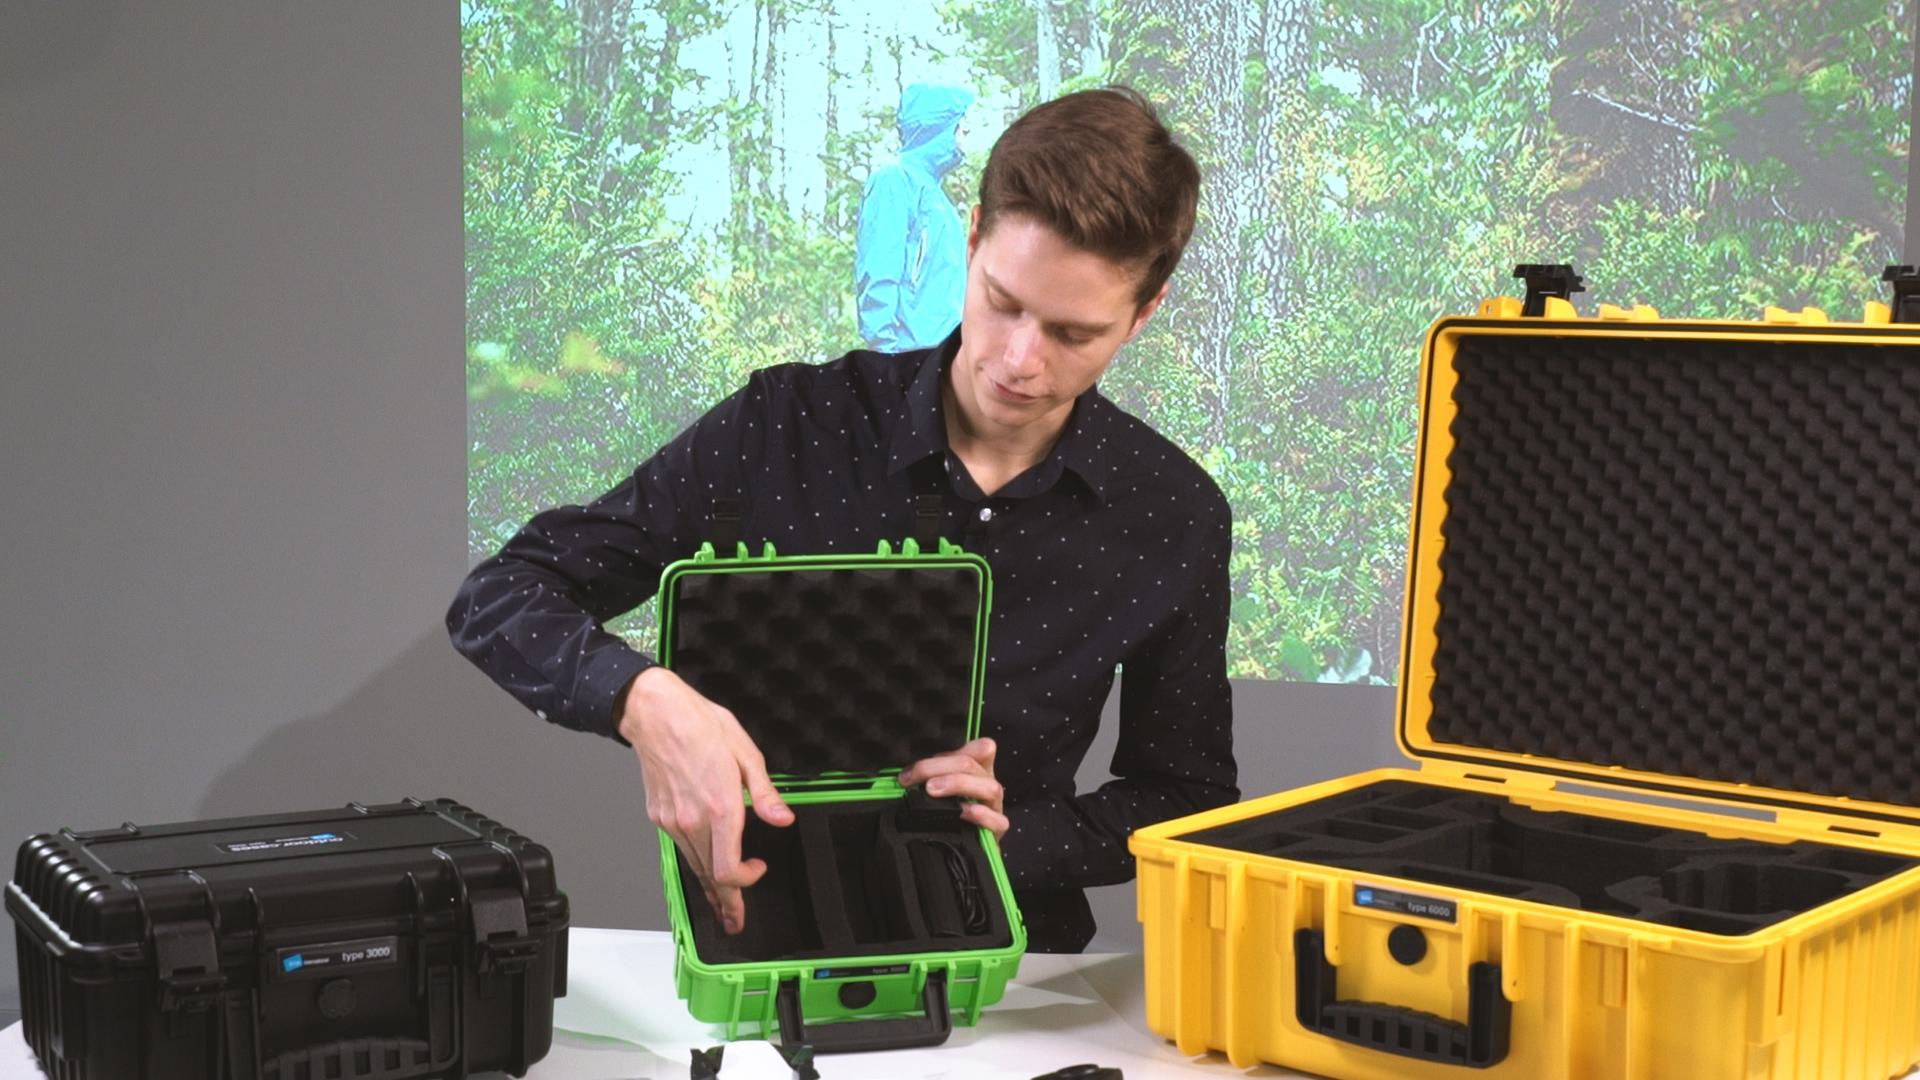 Outdoor Koffer - optimaler Schutz fu00fcr professionelles Kameraequipment